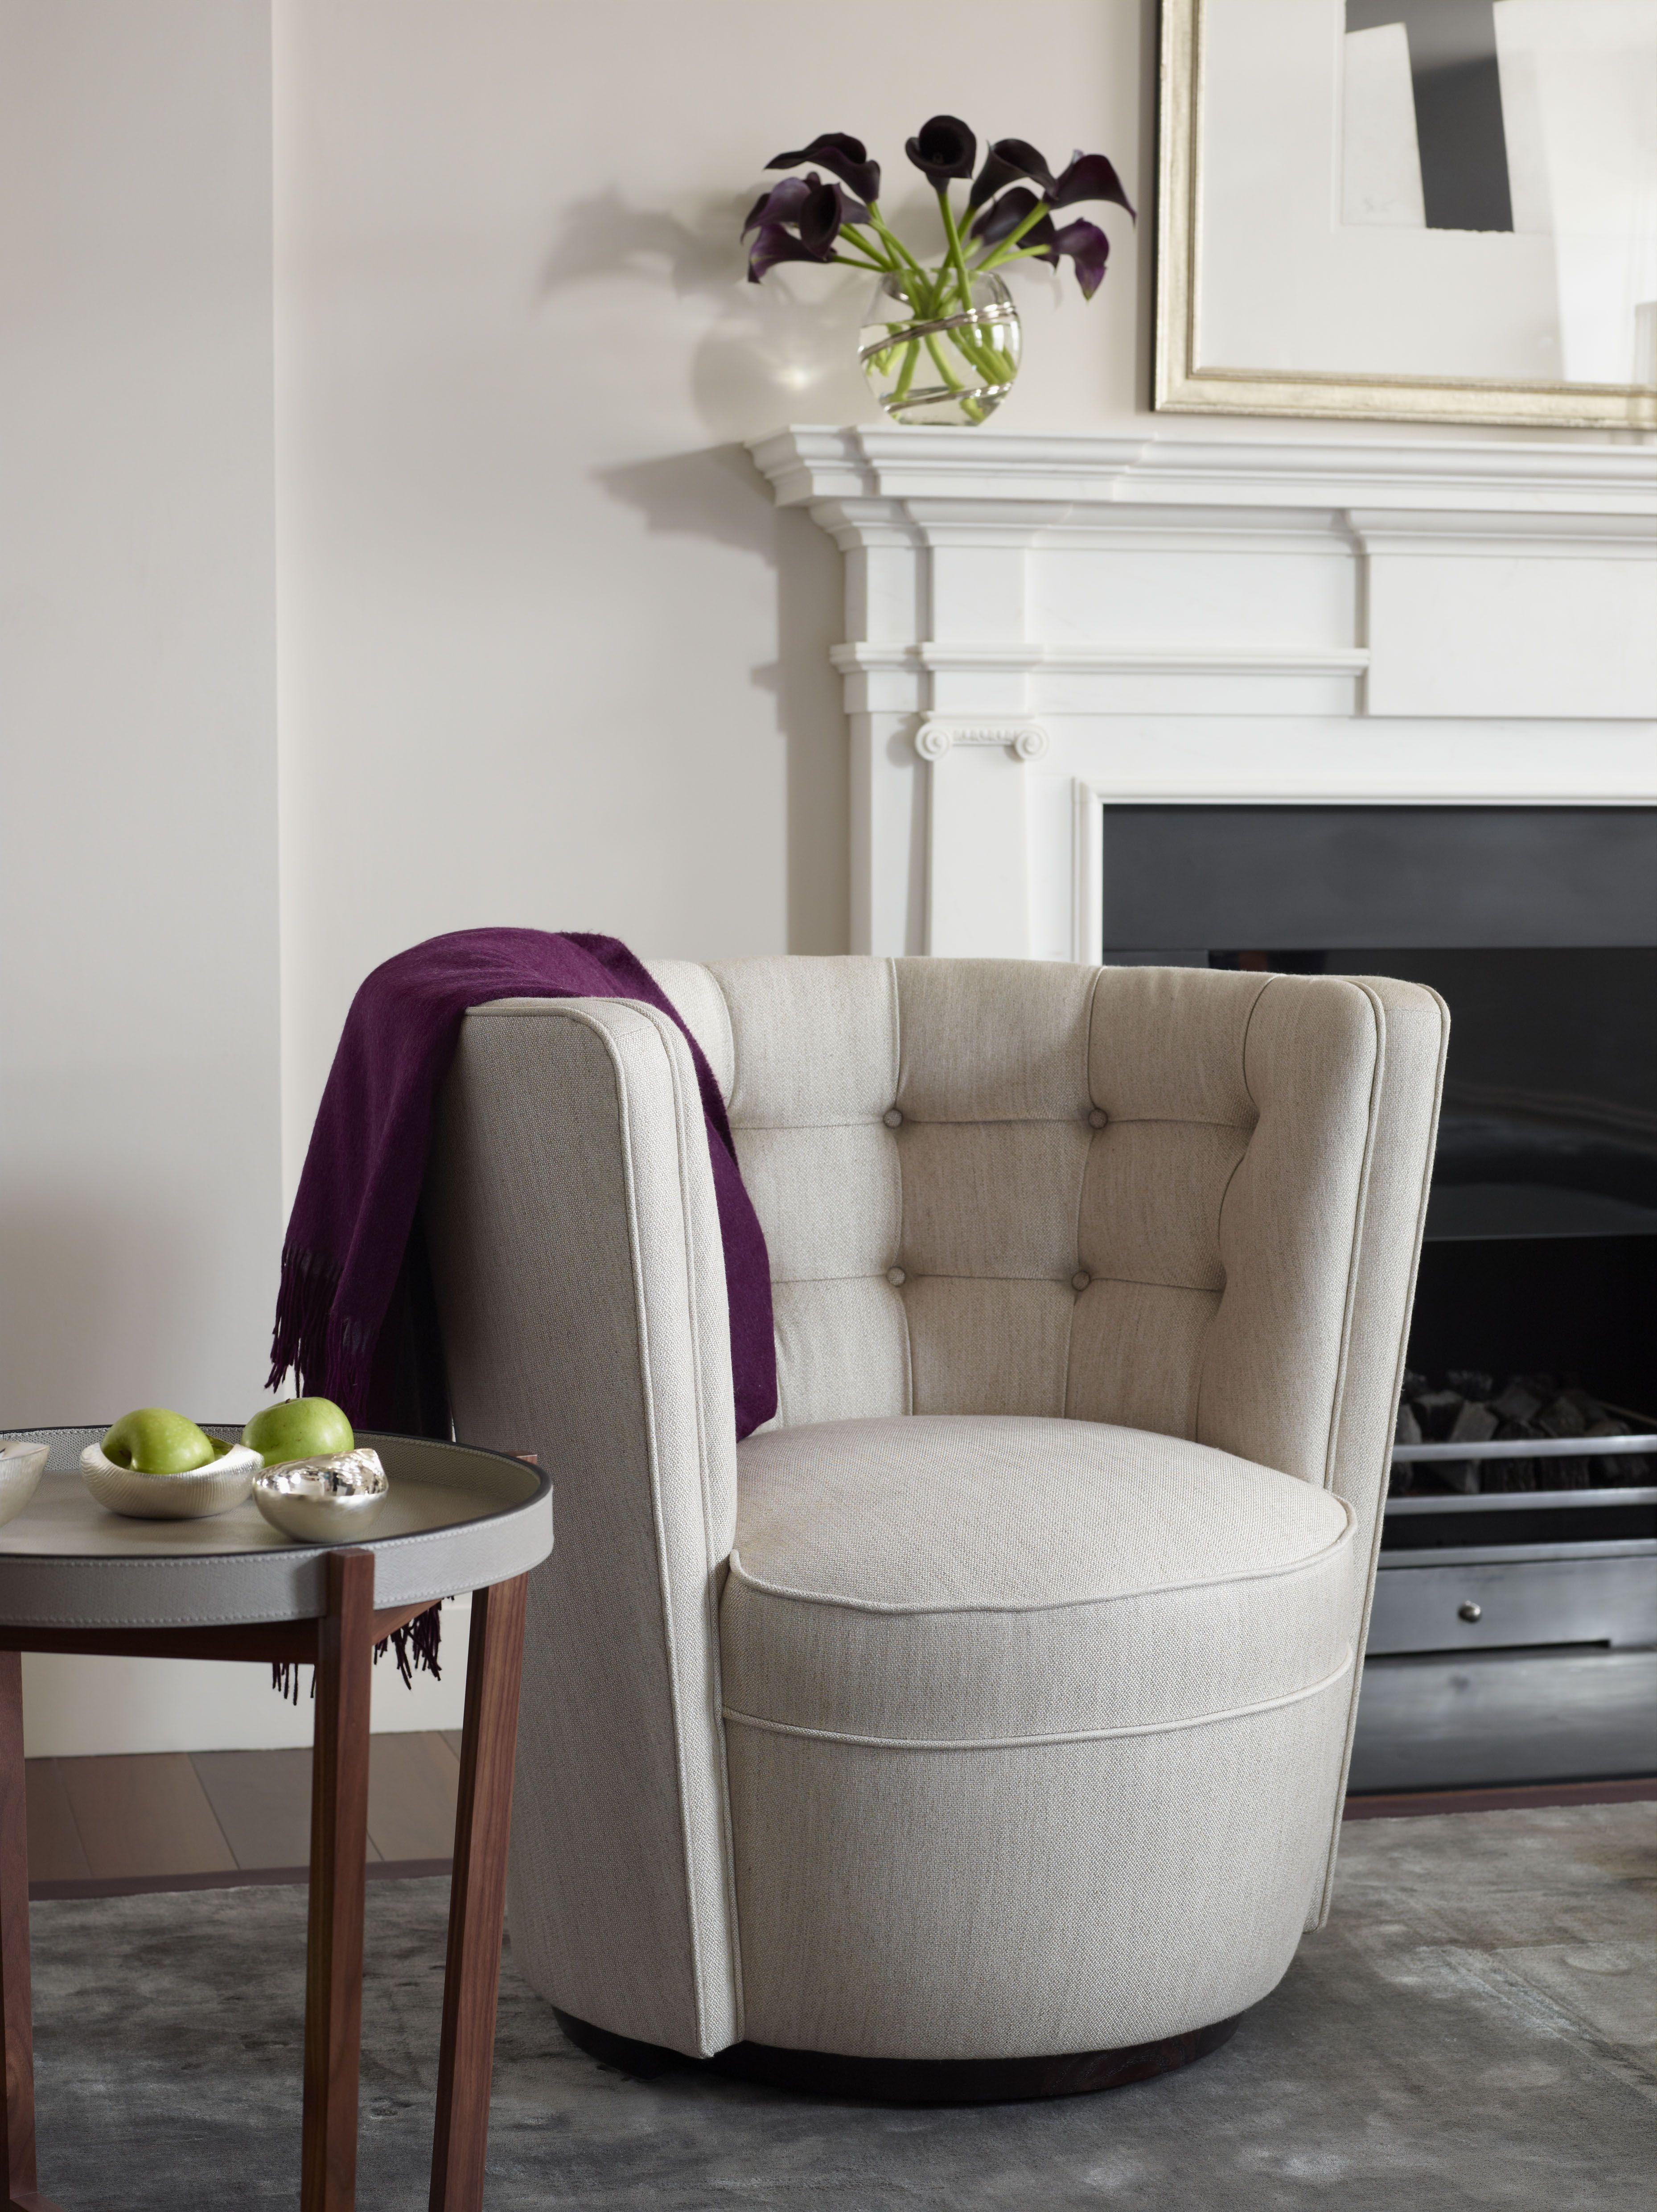 Deco Rotating Tub Chair Chairs Luxury LINLEY